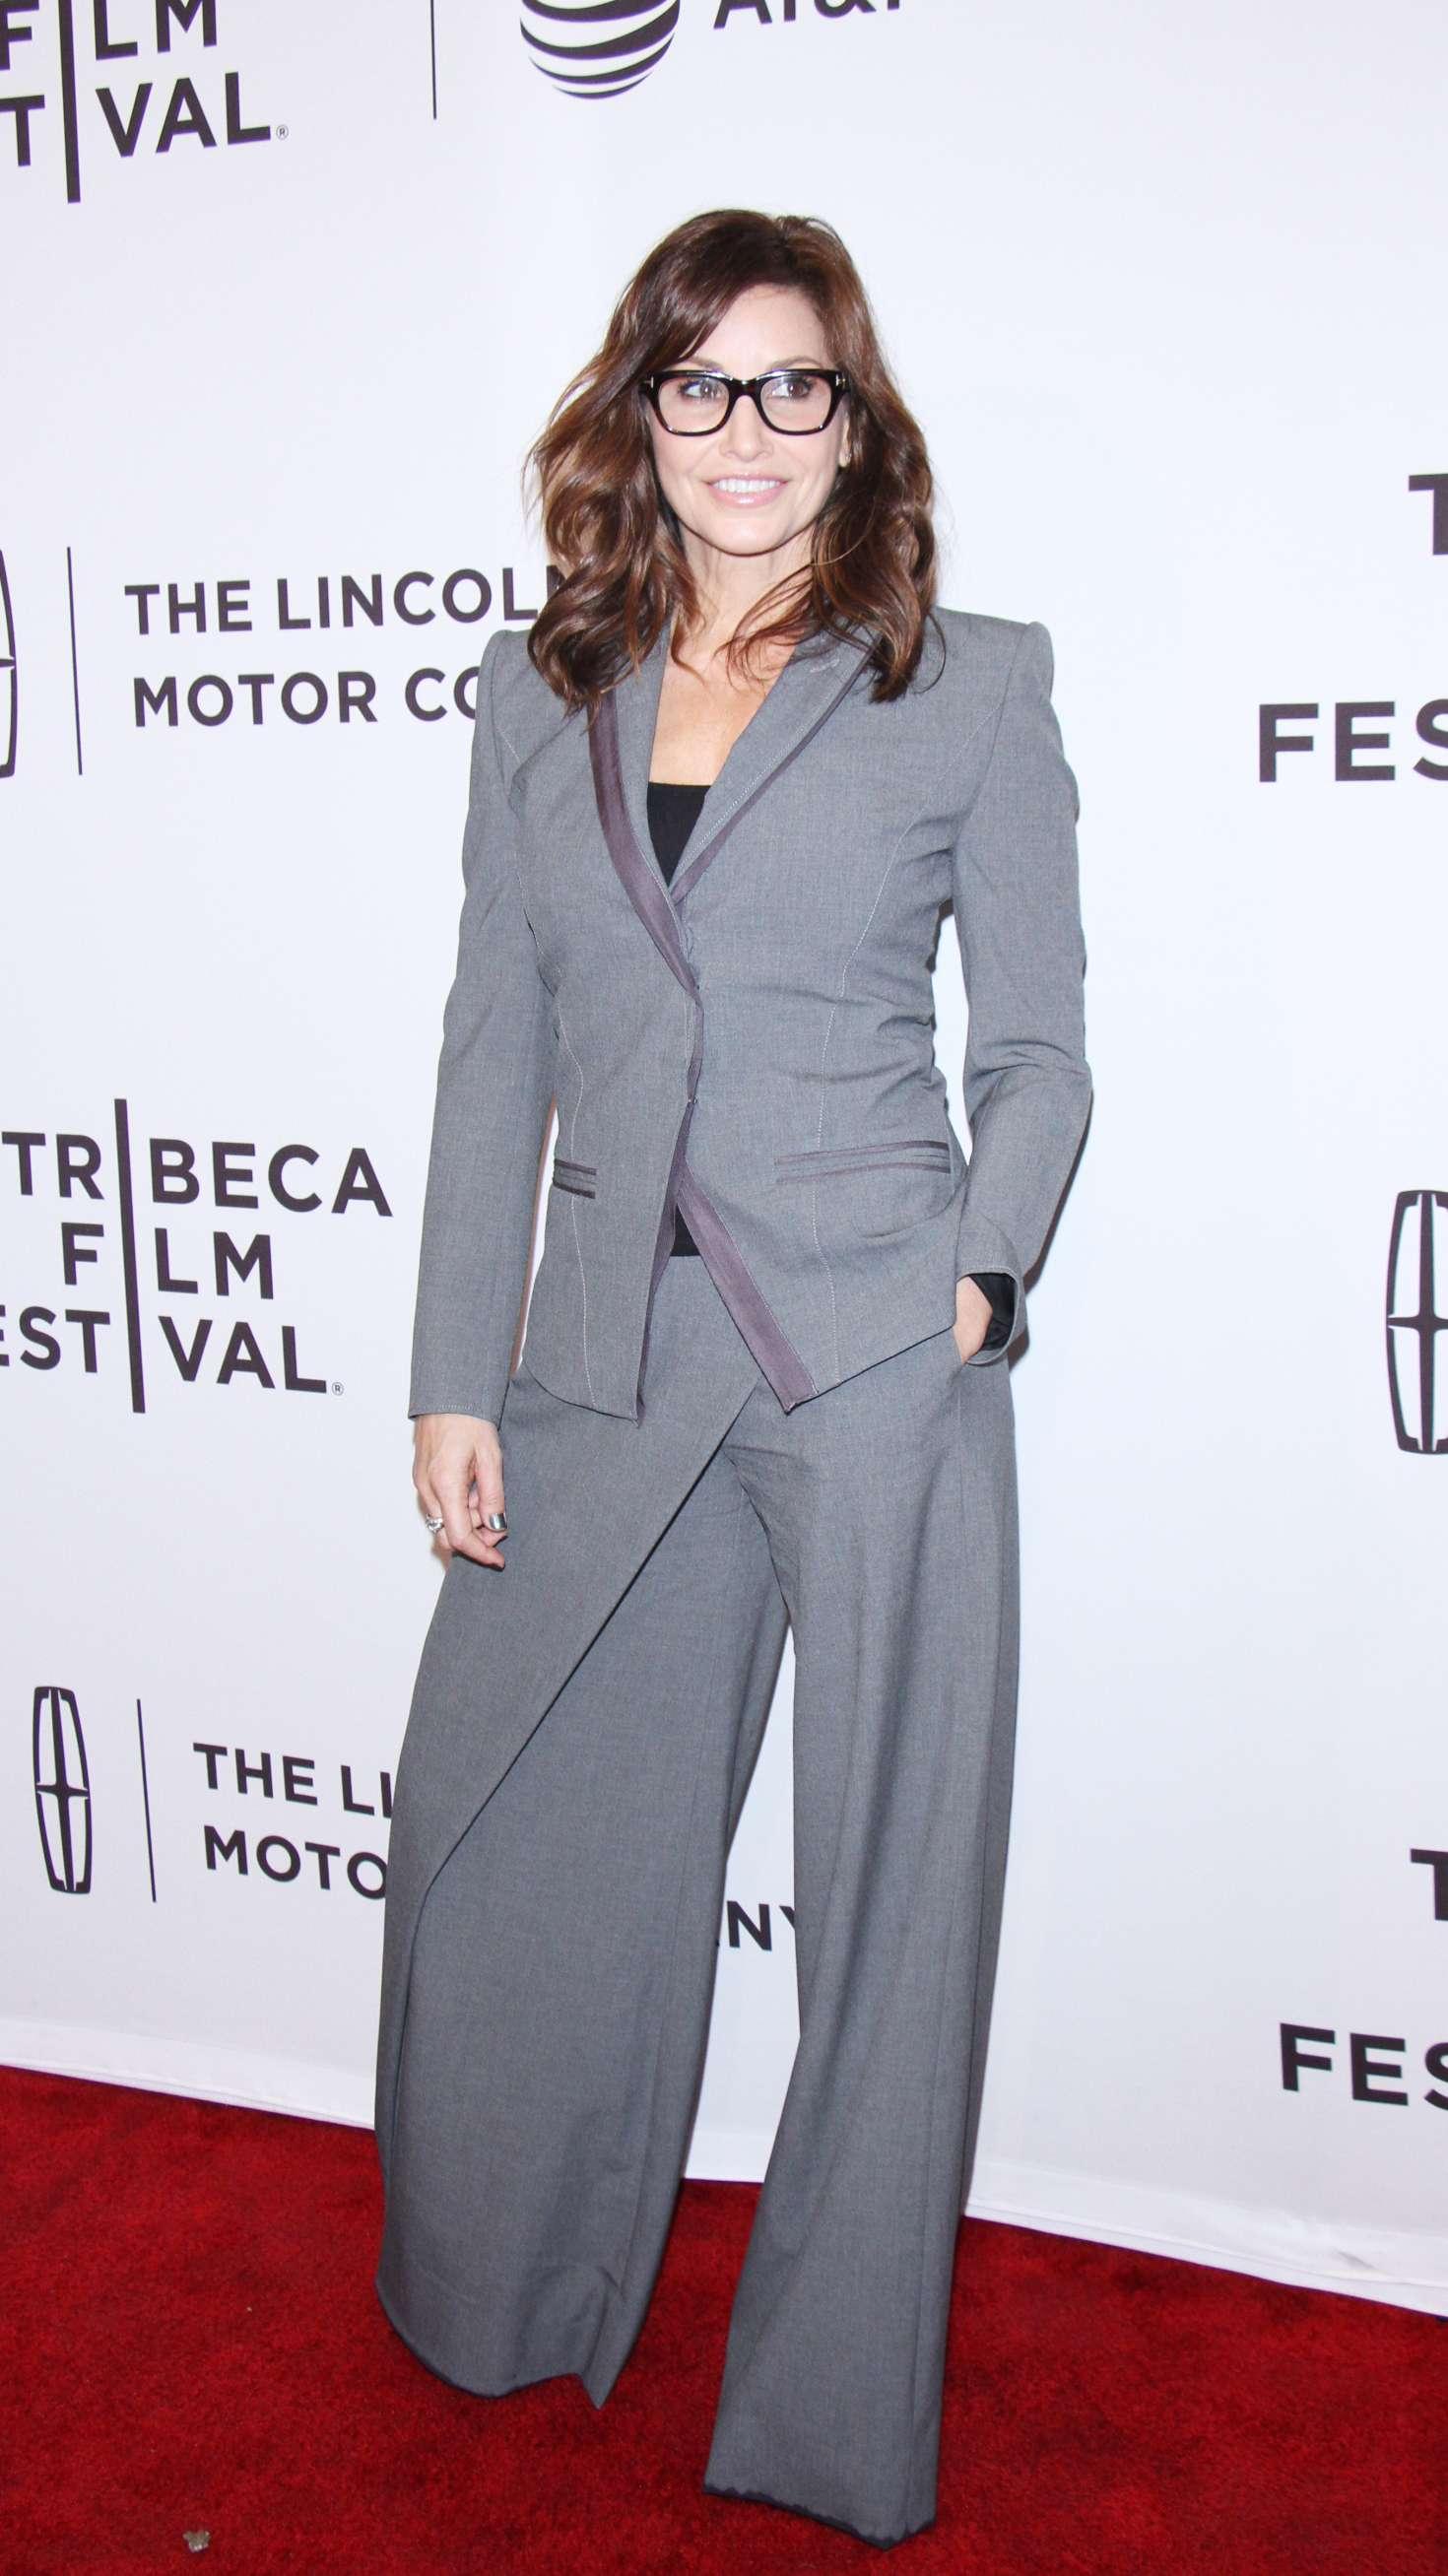 Watch Gina gershon permission screening at tribeca film festival video